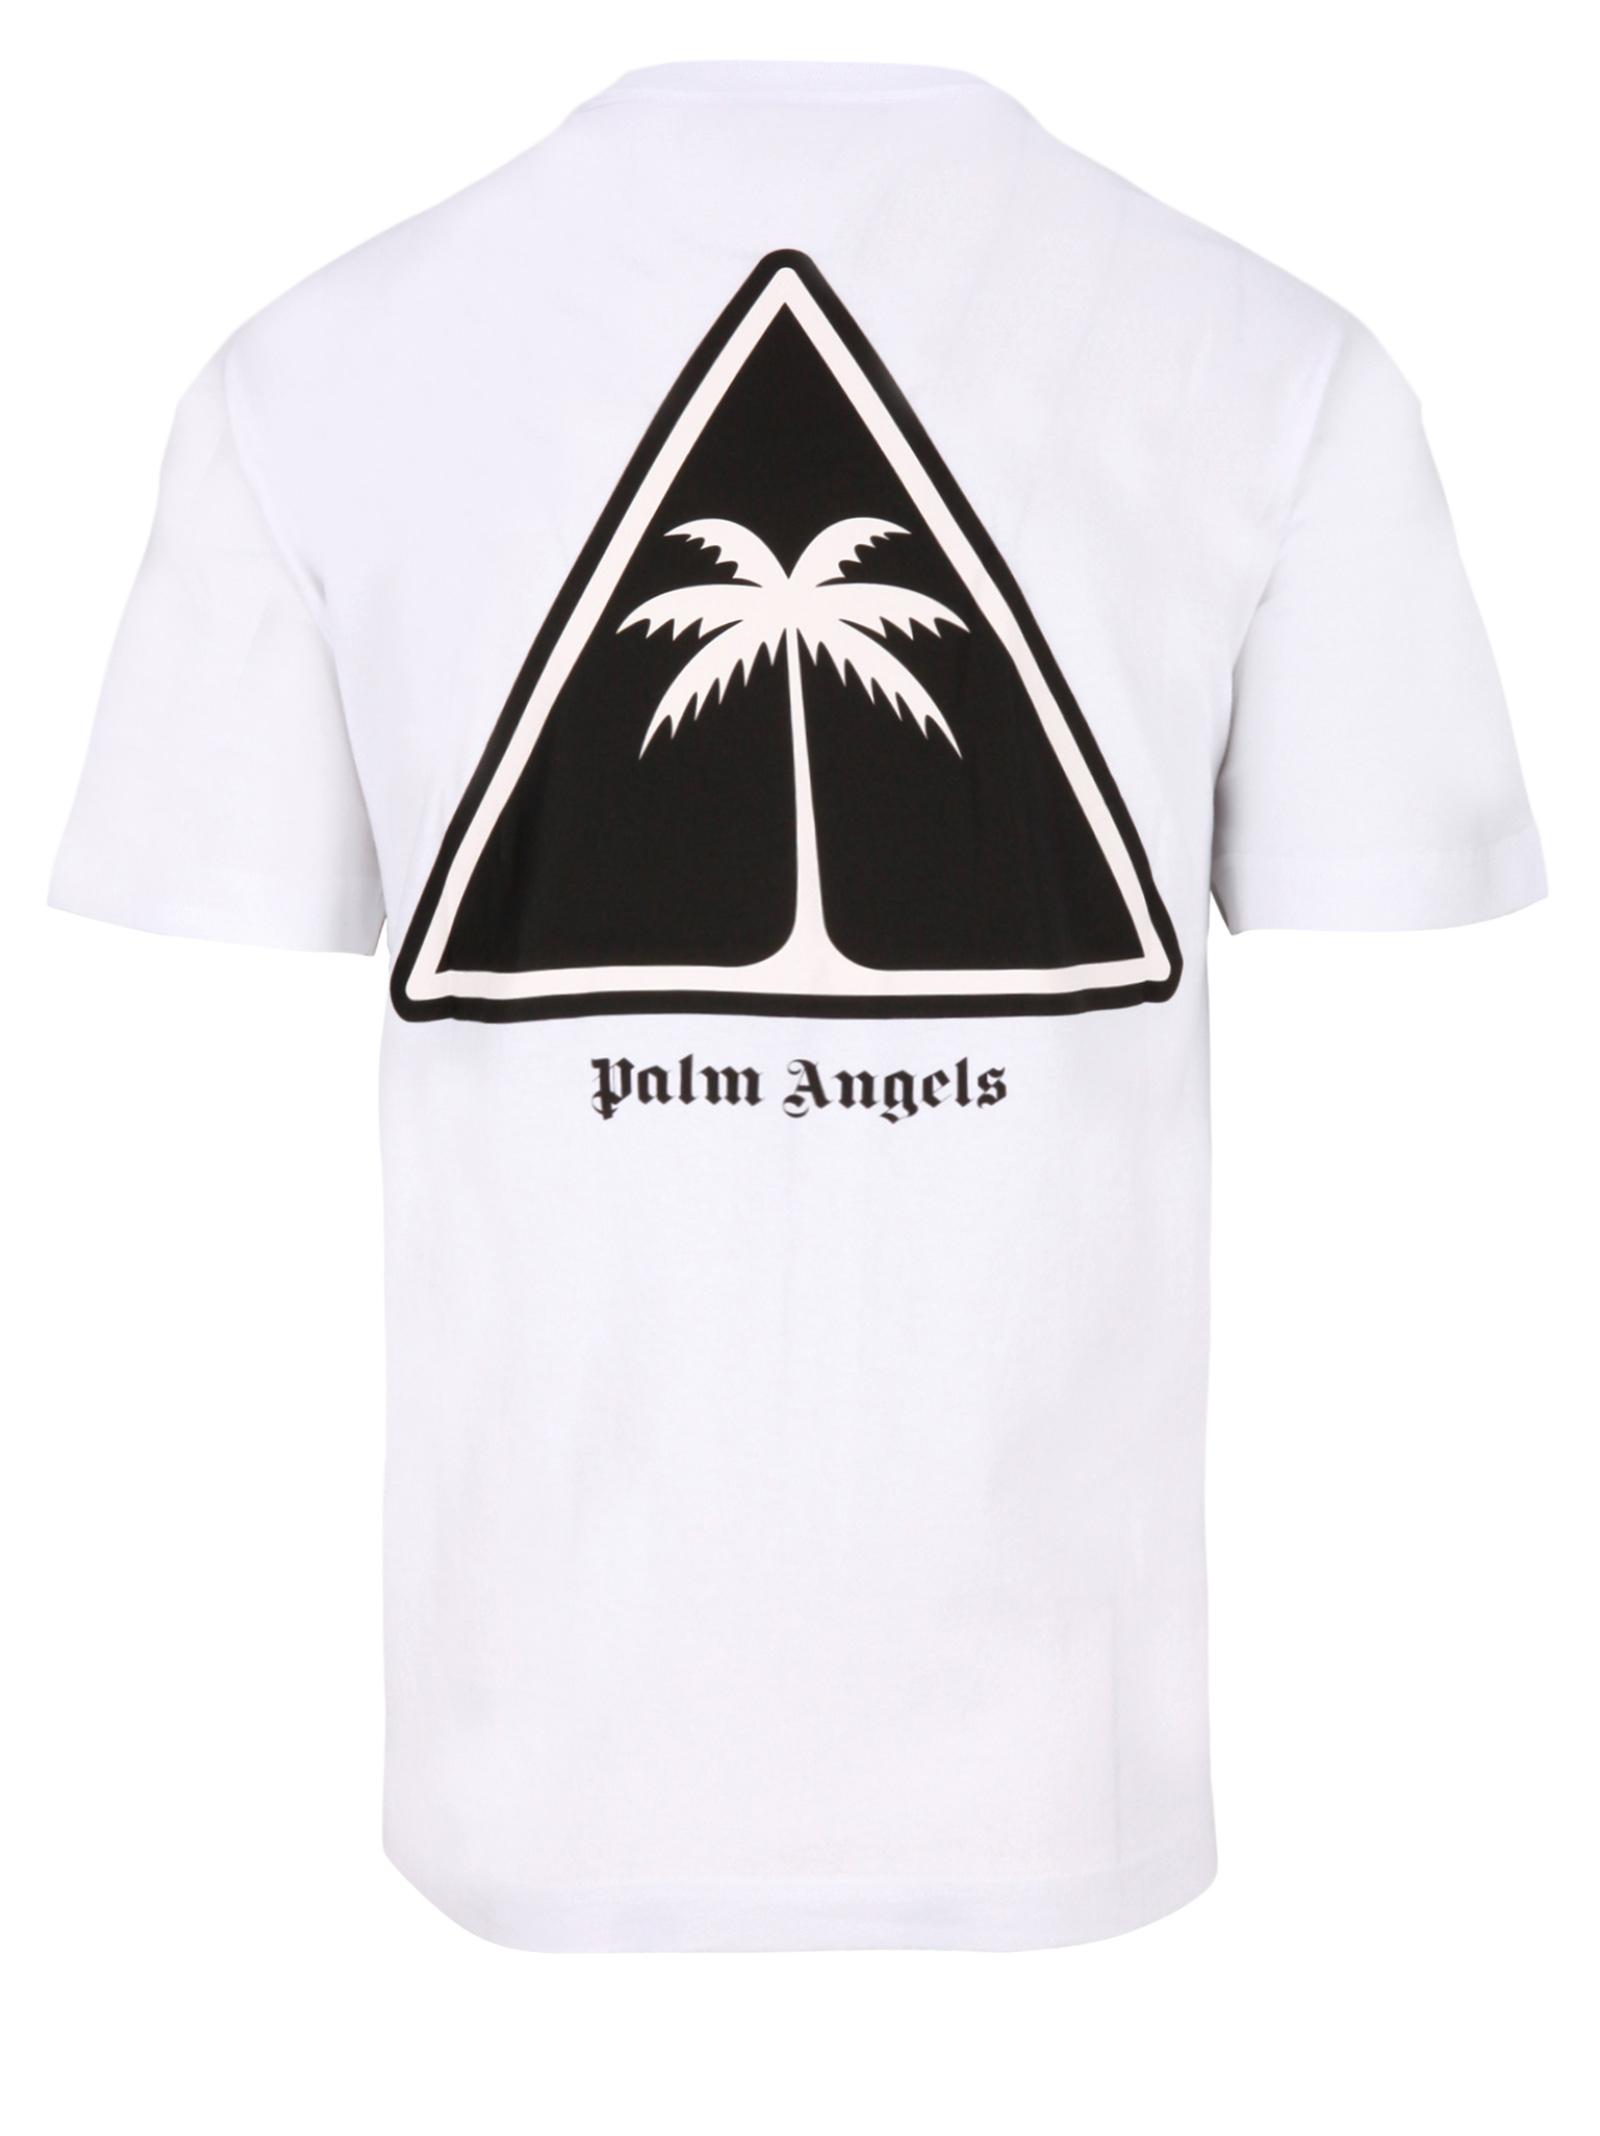 91cce0f98b Michele Franzese Moda. 0. Palm Angels t-shirt Palm Angels   8    AA001S194130110110